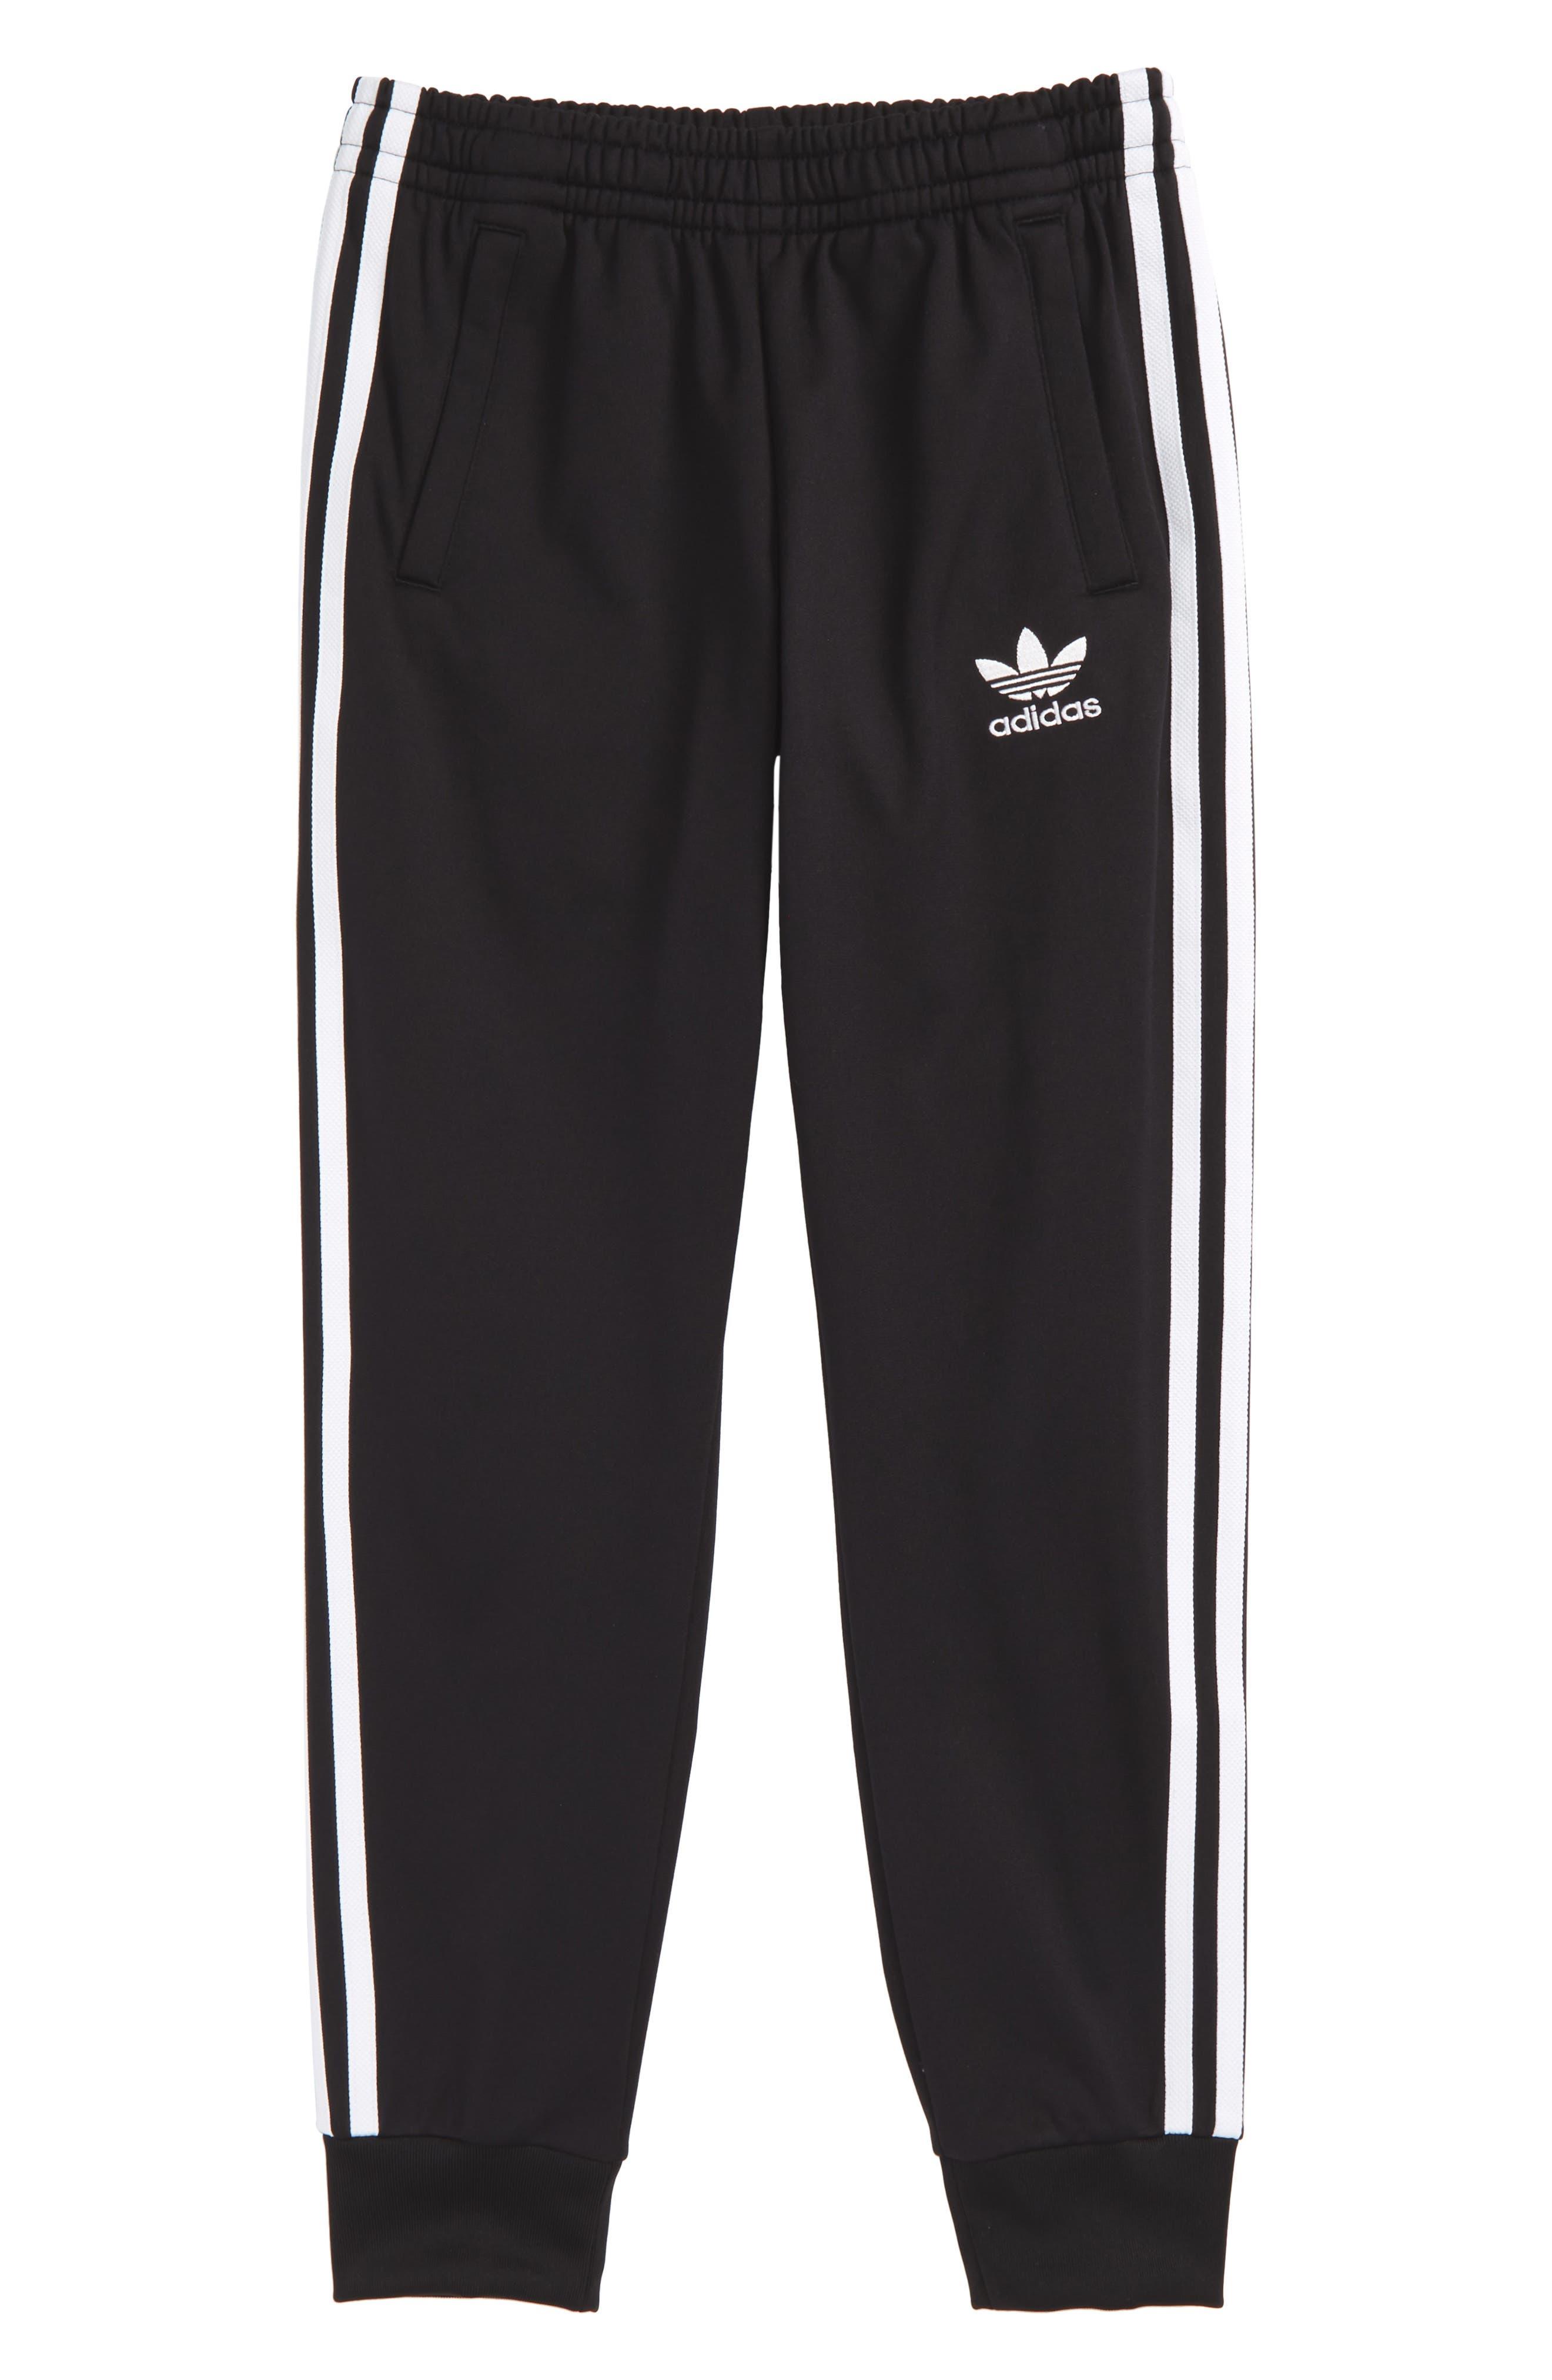 adidas Originals Superstar Track Pants (Little Boys & Big Boys)